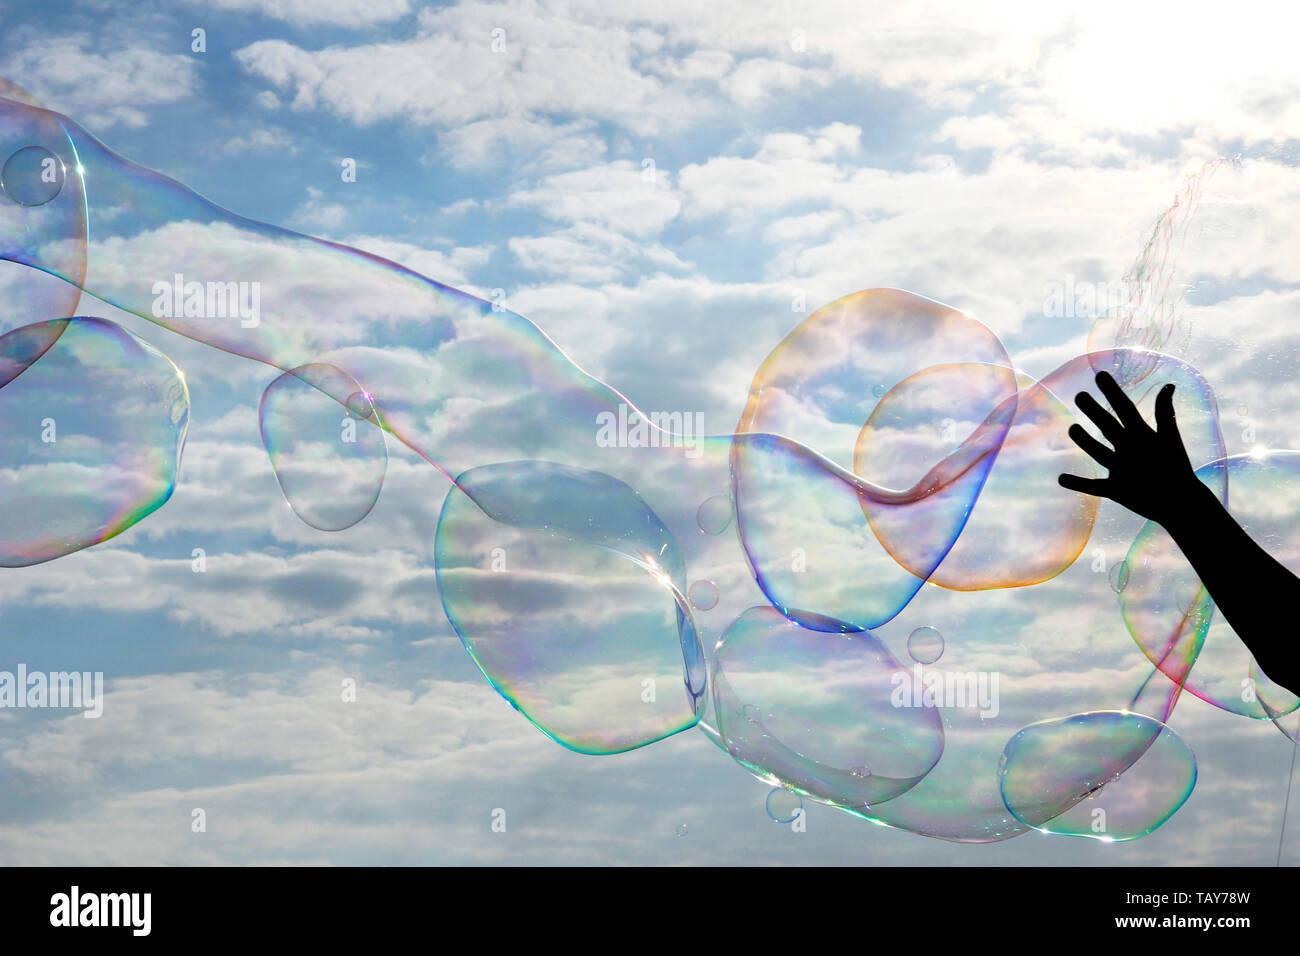 Riesige soapbubbles im Himmel Stockfoto